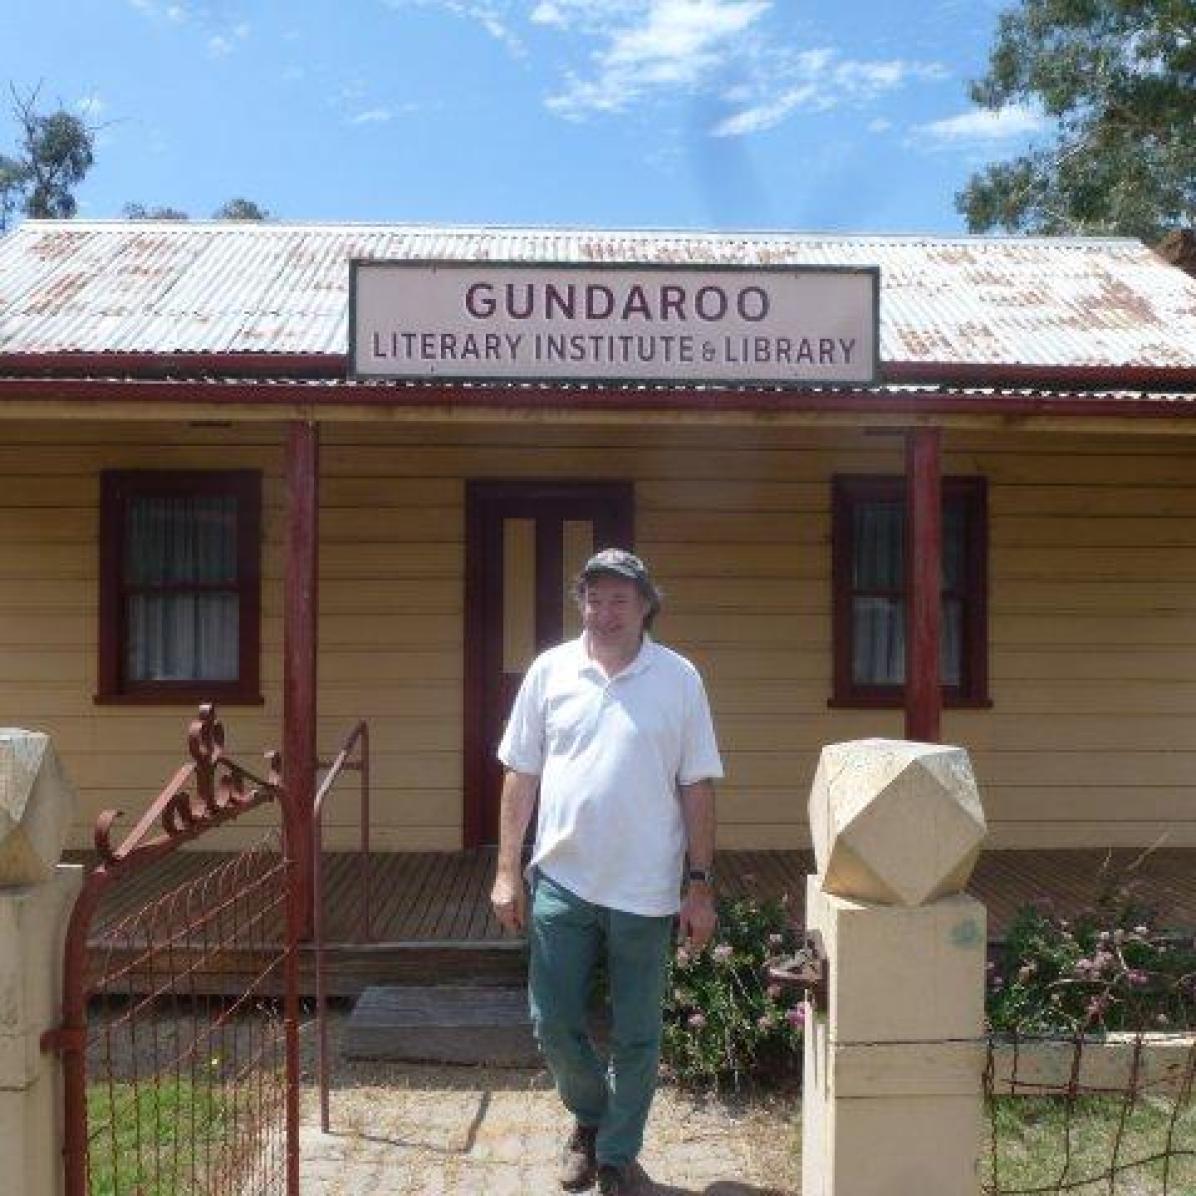 Christof at the Gundaroo Literary Institute & Library